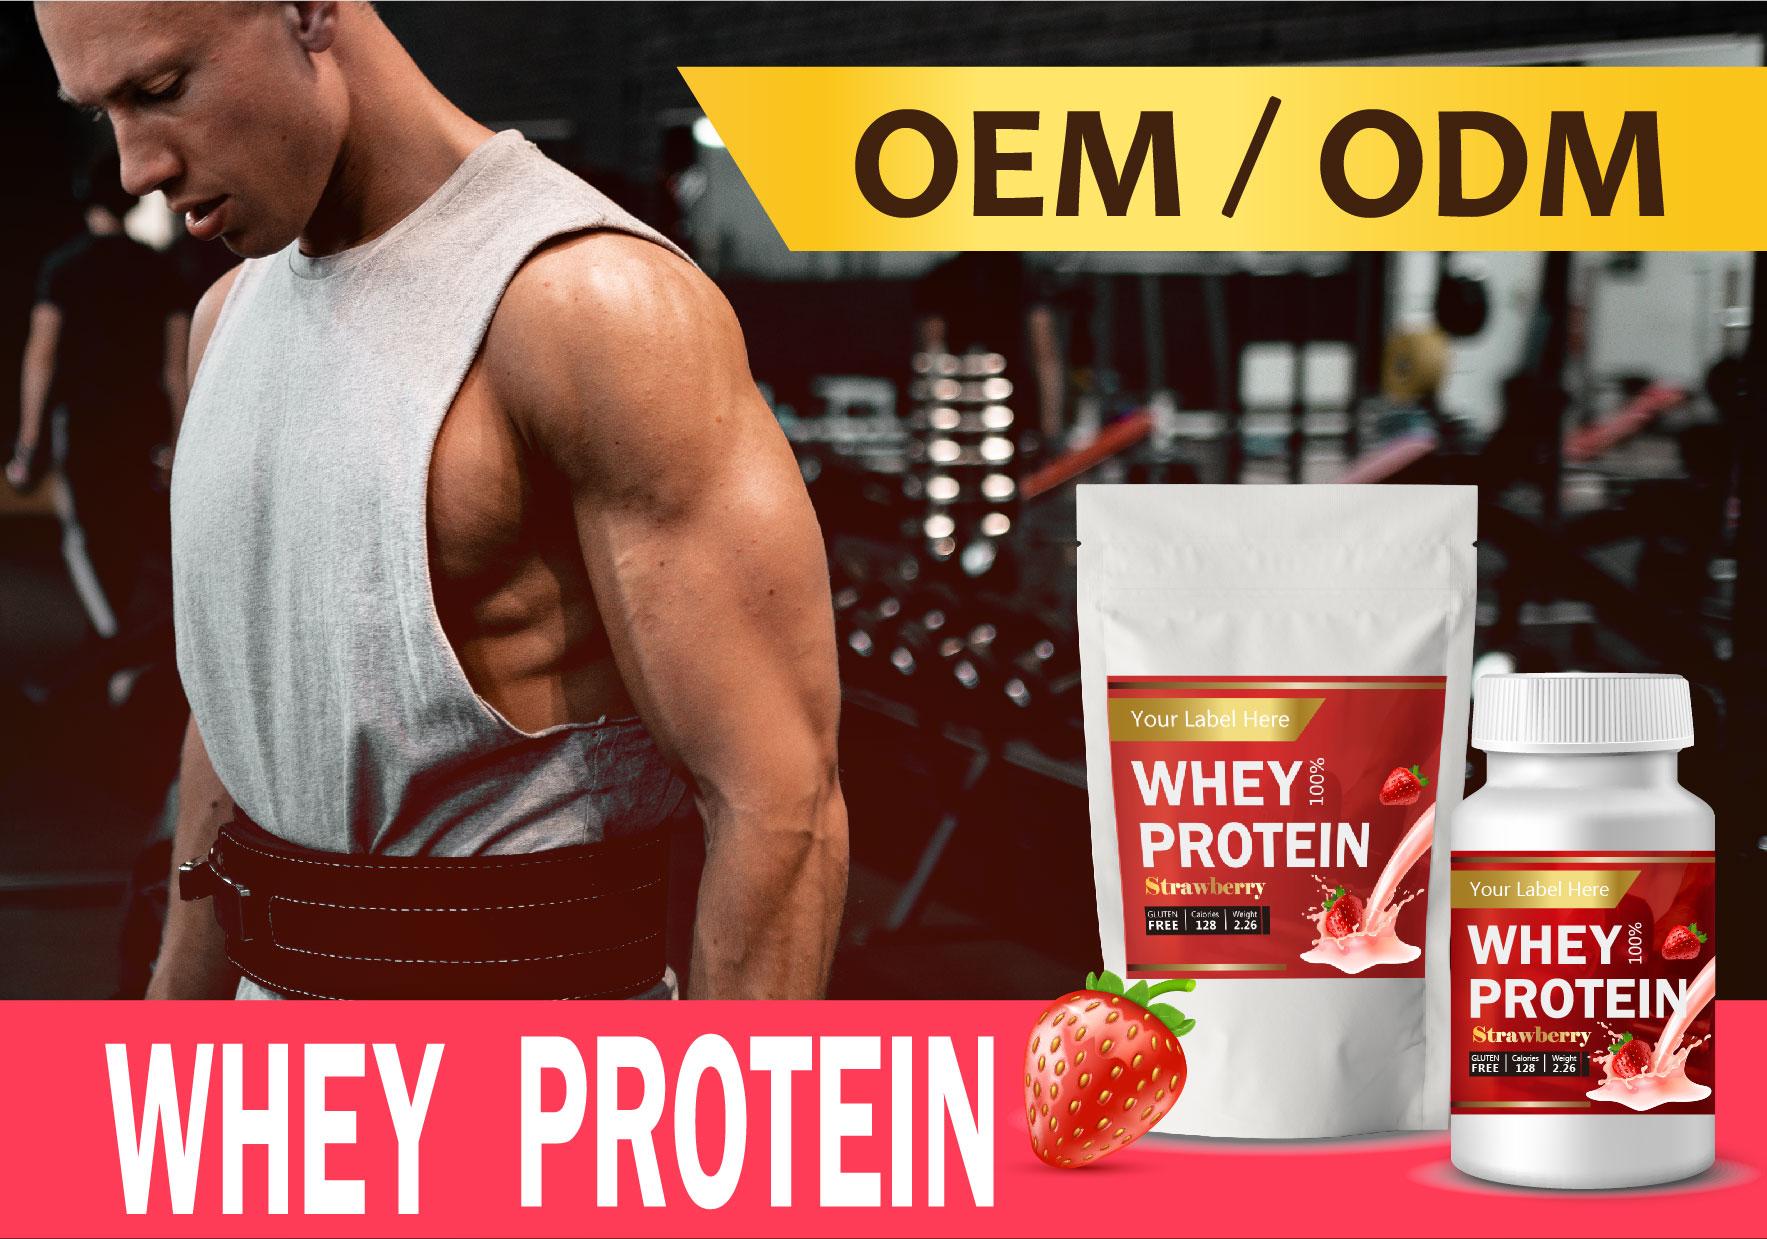 Sports Whey Protein Powder Nutrition Bcaa Strawberry Milkshake Custom Manufacturer Oem - Buy